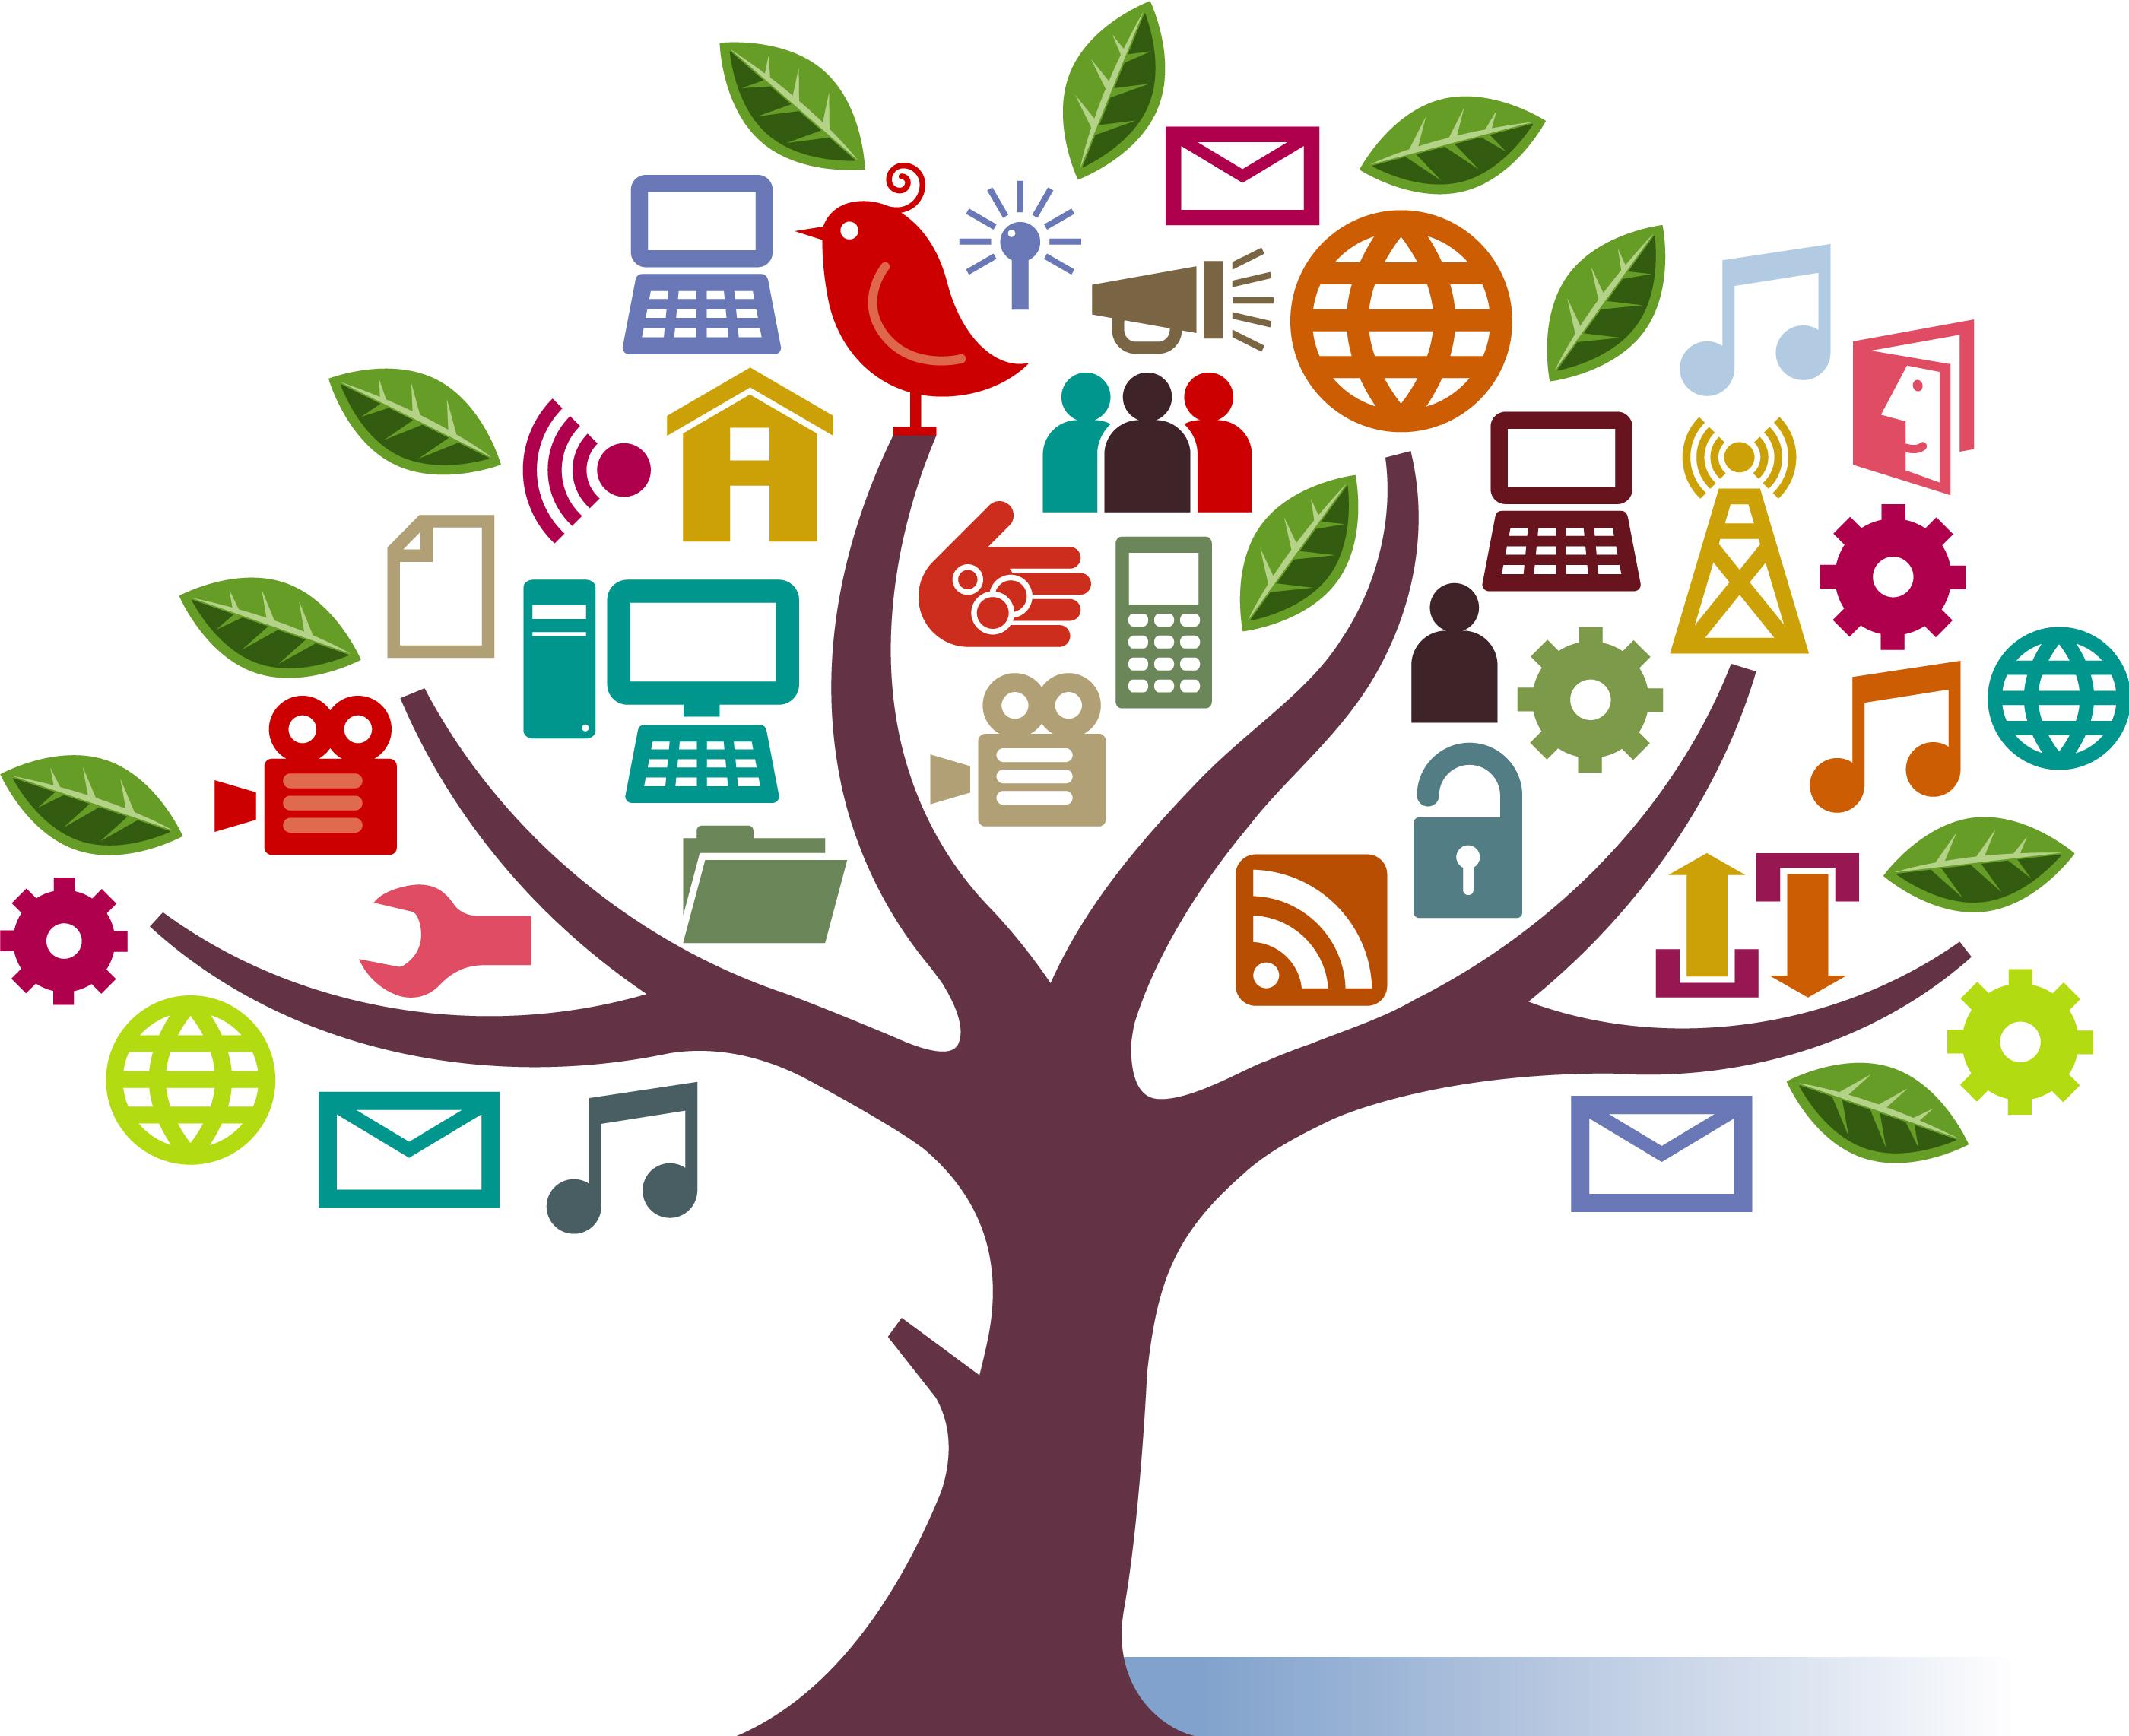 tipps de redes sociales